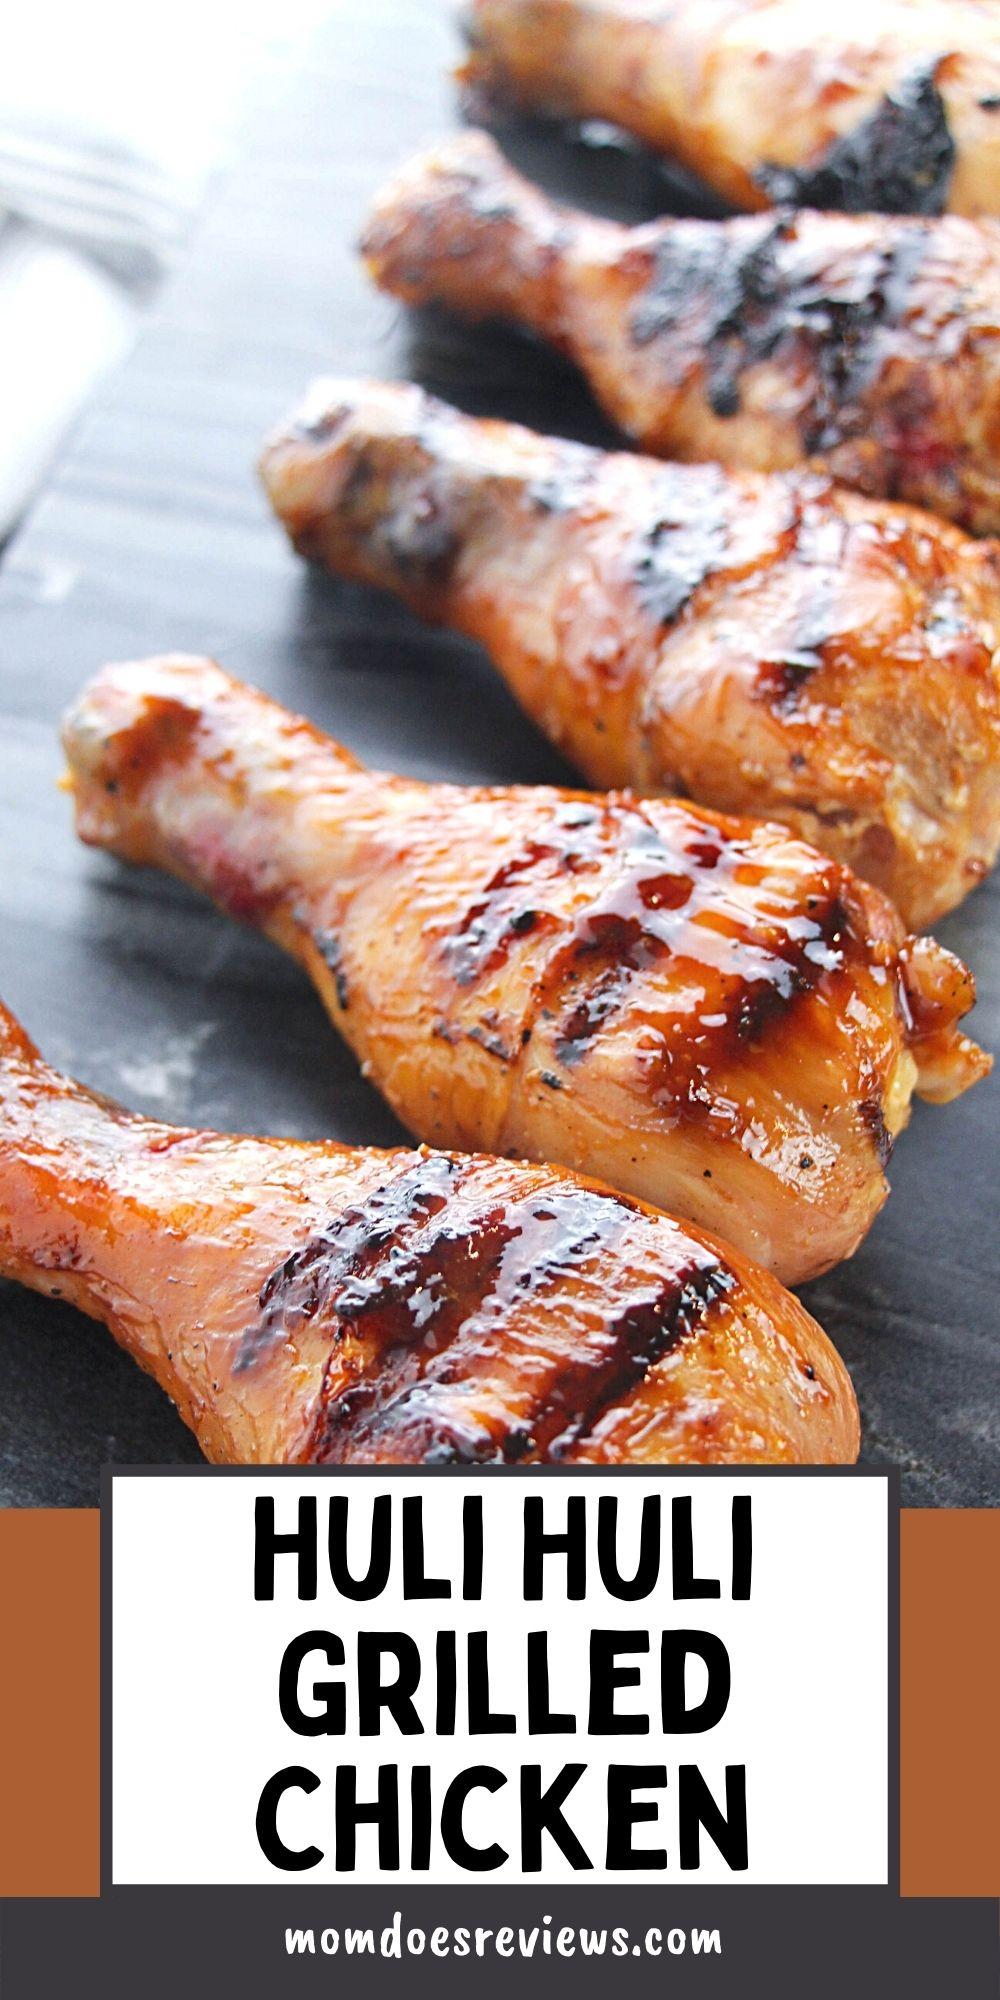 Grilled Hawaiian Huli Huli Chicken #Recipe #grilledchicken #foodie